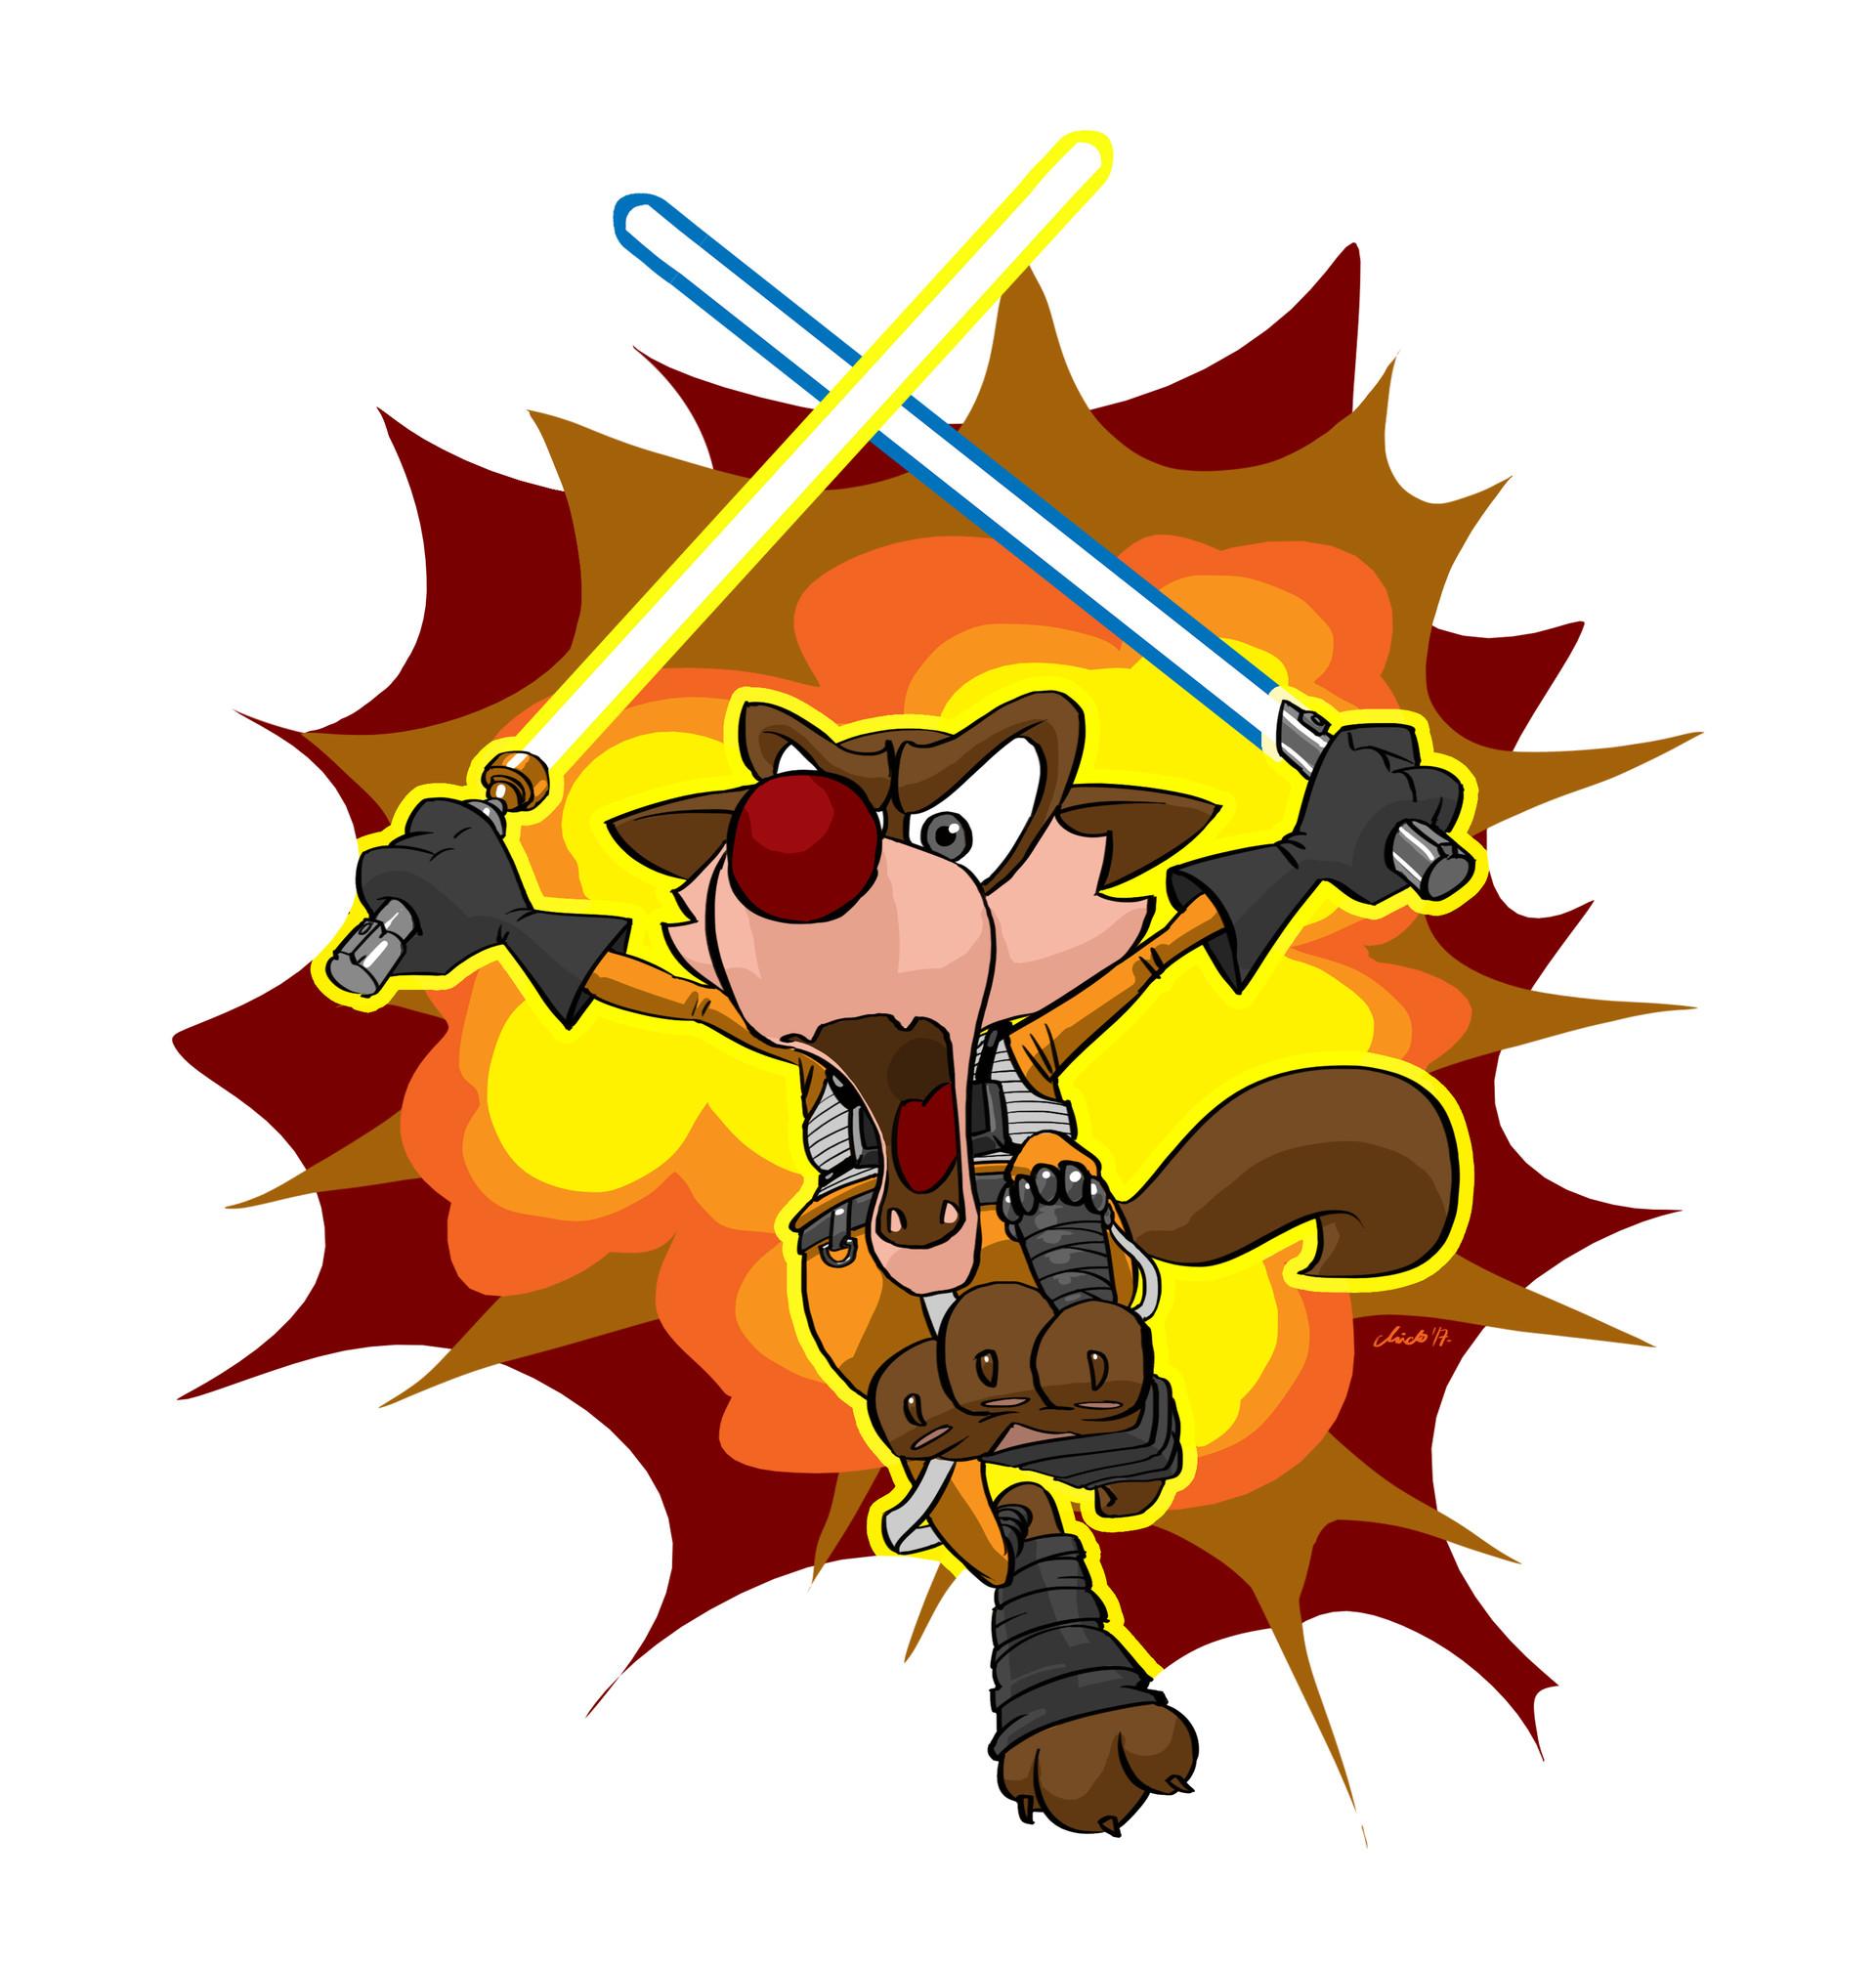 Midhat kapetanovic star wars vucko 01